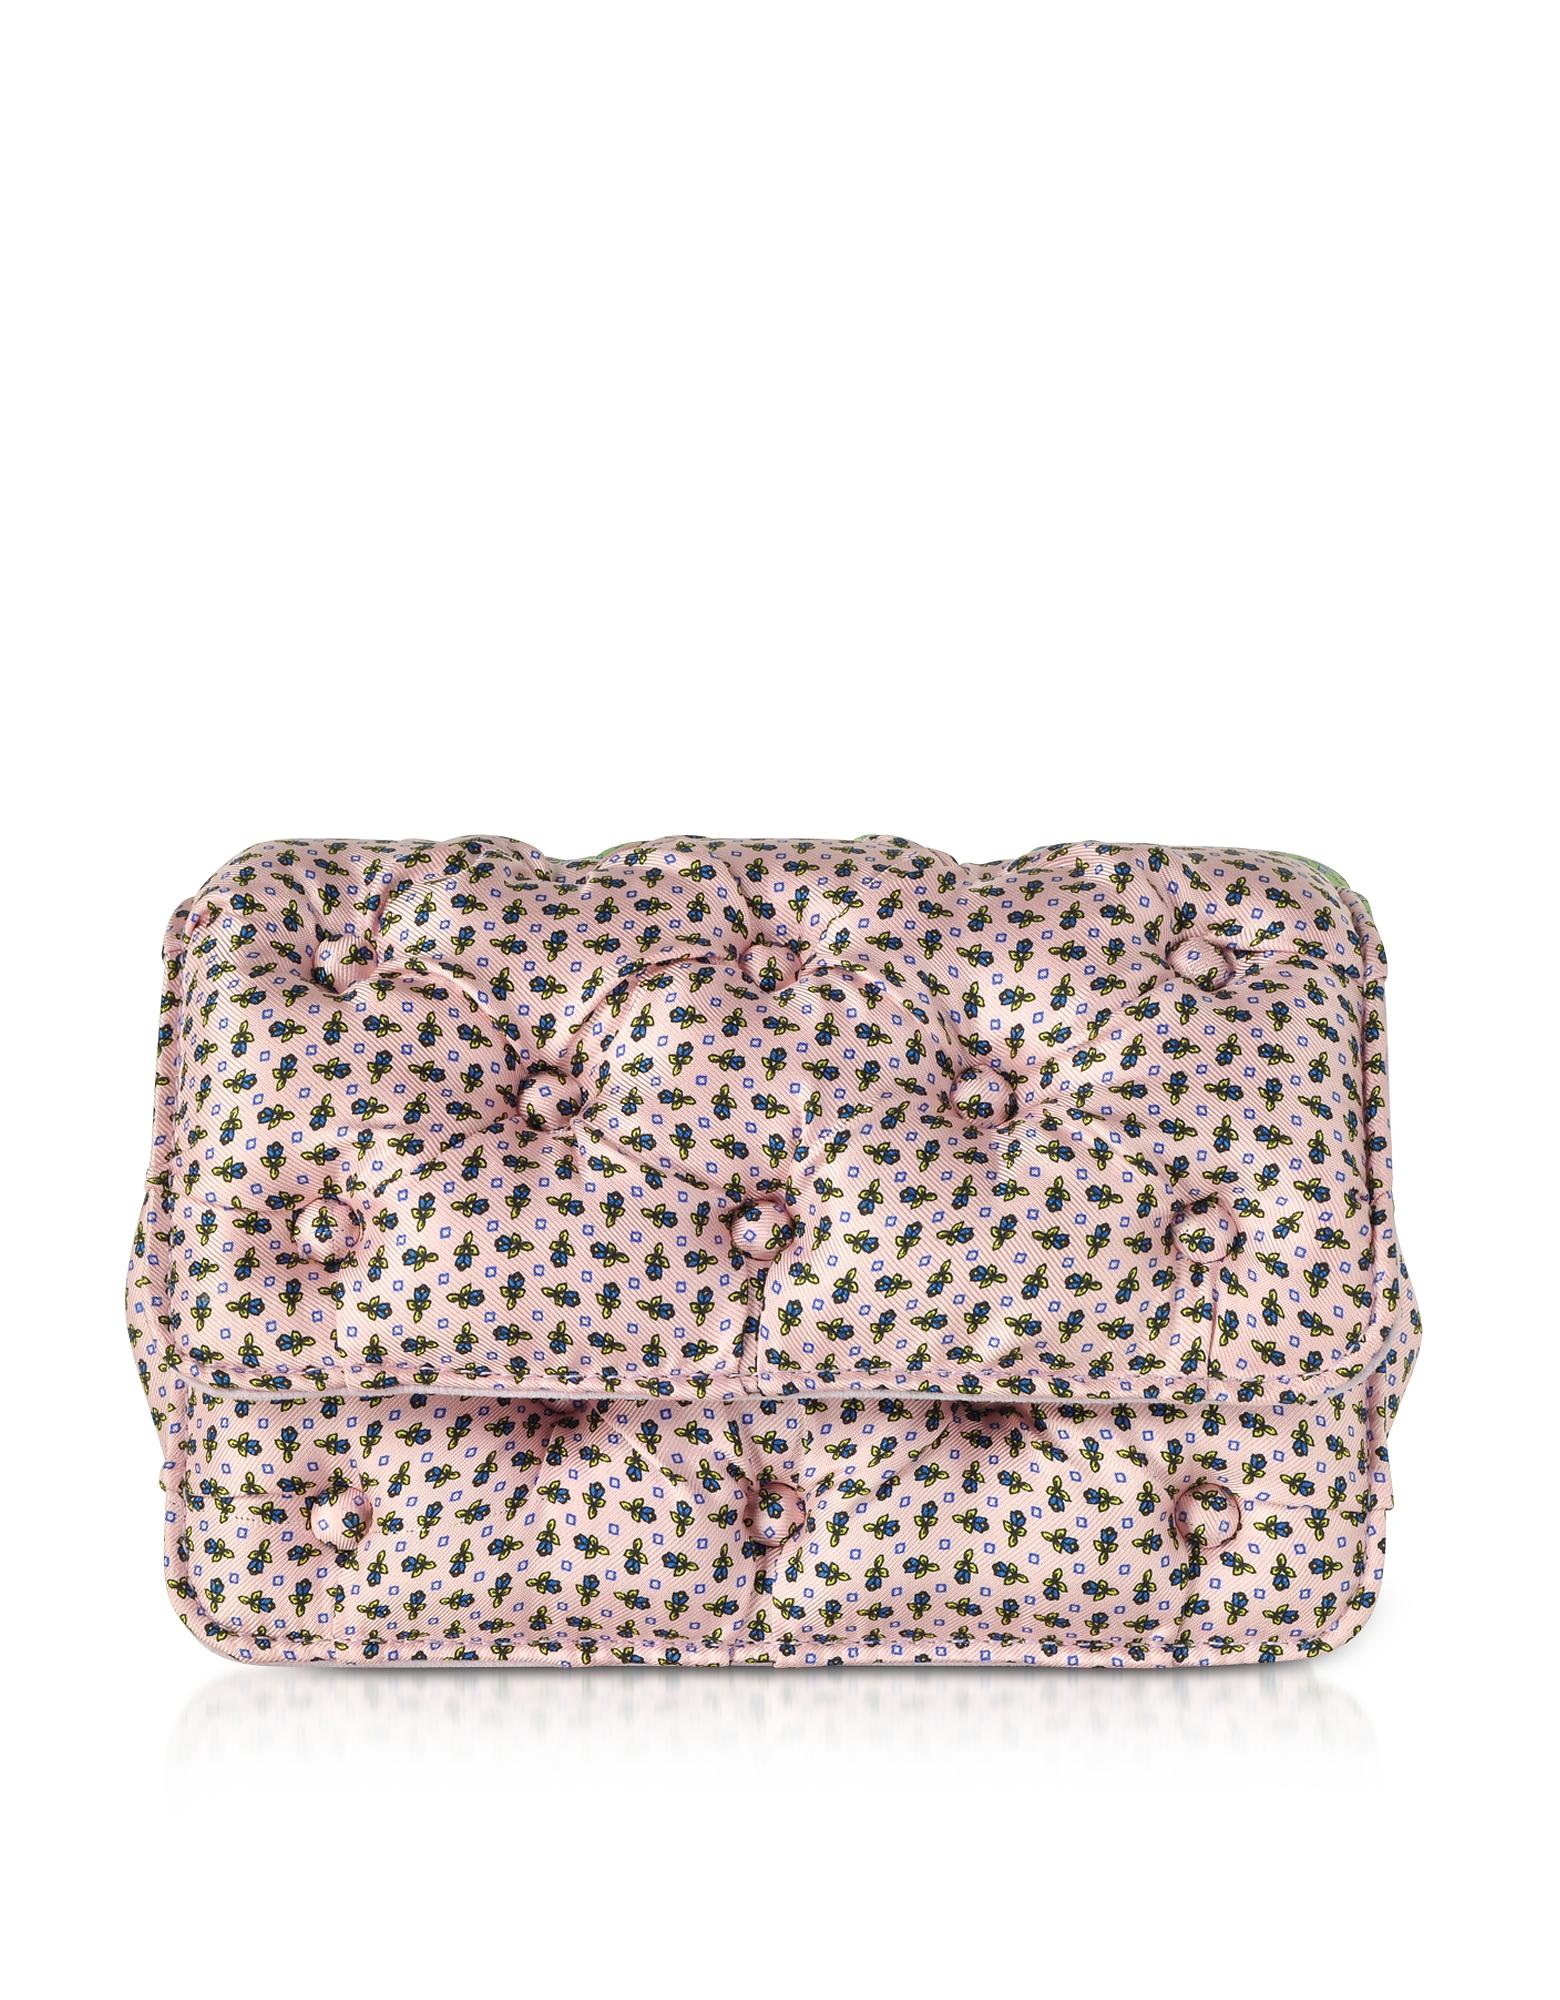 Benedetta Bruzziches Handbags, Floral Printed Pink Satin Silk Carmen Shoulder Bag